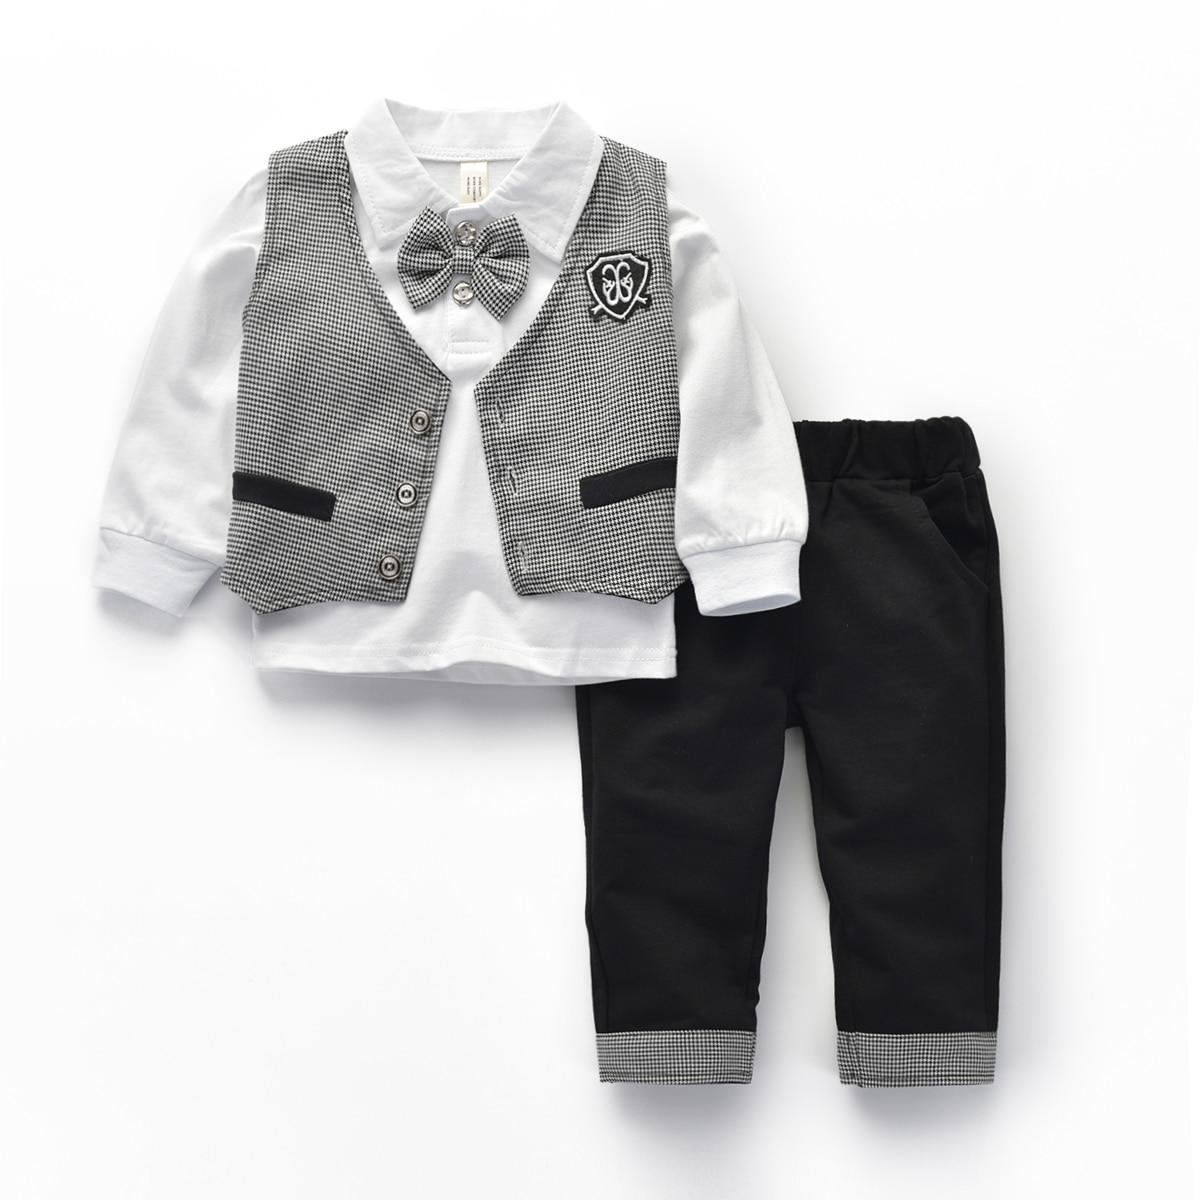 Pieces, Kids, Clothing, Set, pant, Boys